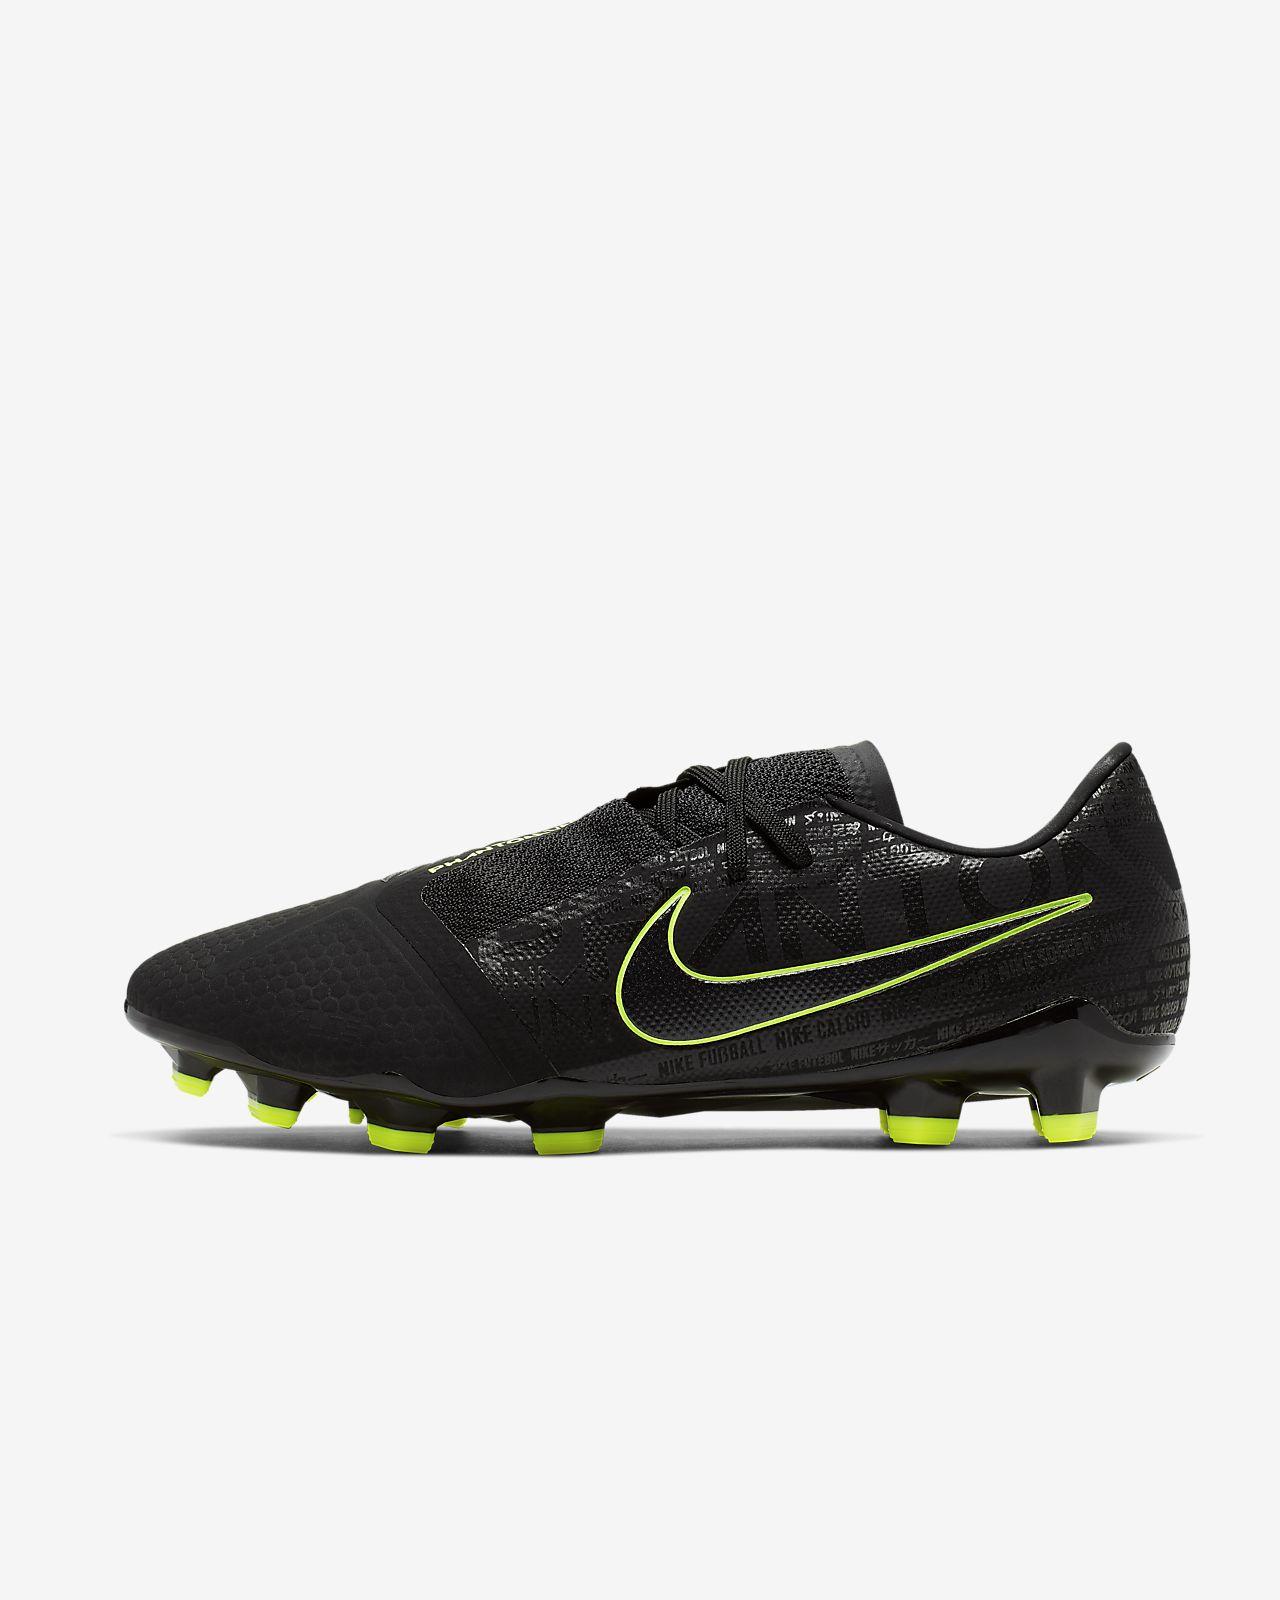 Nike Phantom Venom Pro FG Firm-Ground Football Boot